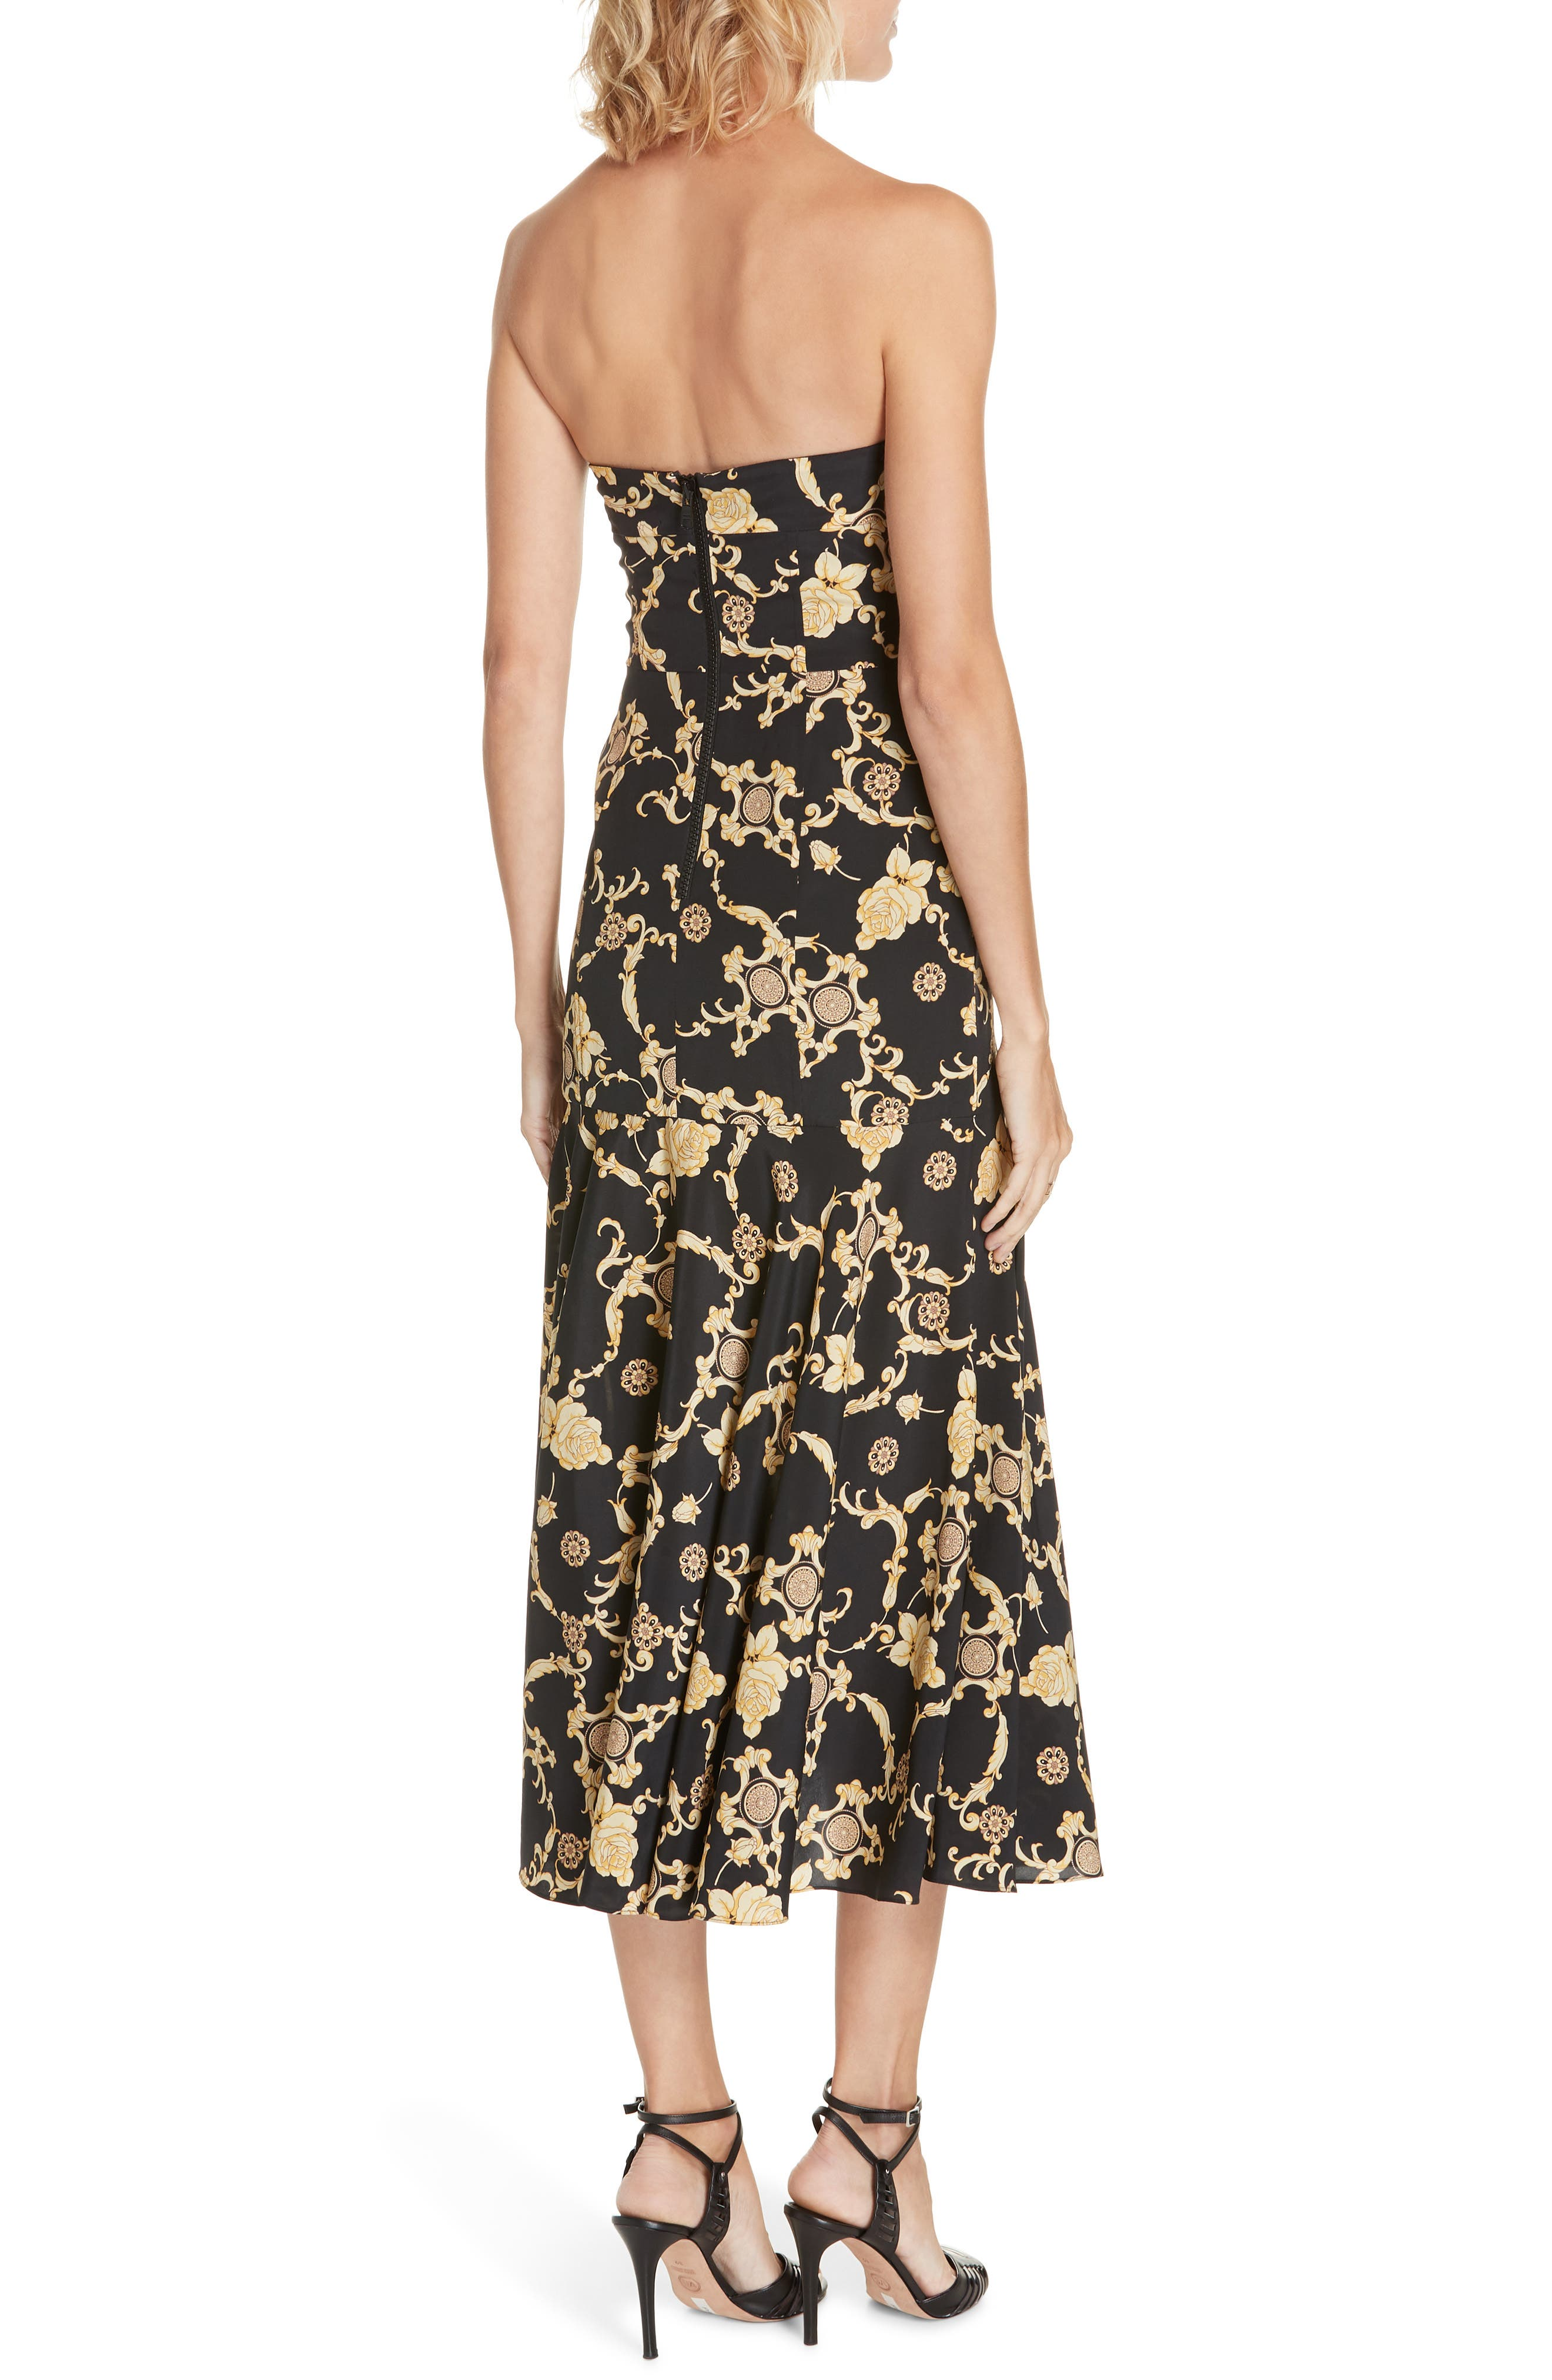 Annika Floral Print Strapless Stretch Silk Dress,                             Alternate thumbnail 2, color,                             BLACK/ GOLD